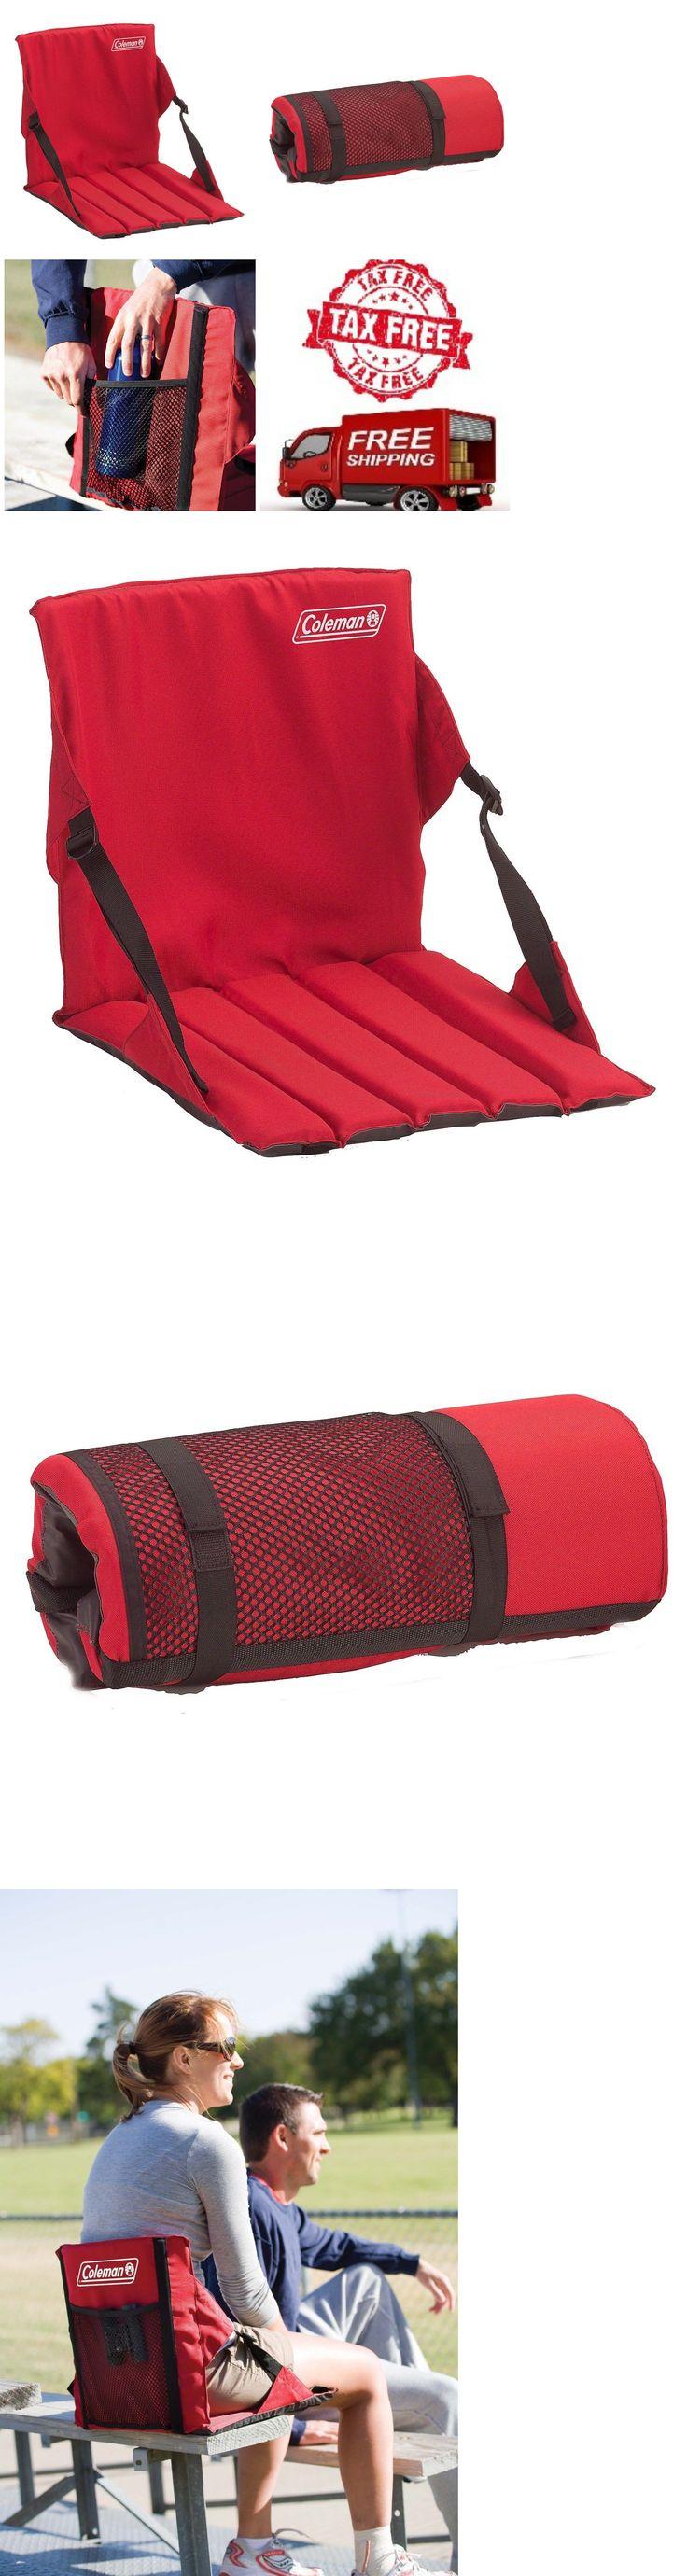 Camping Furniture Lightweight Portable Stadium Seat Chair